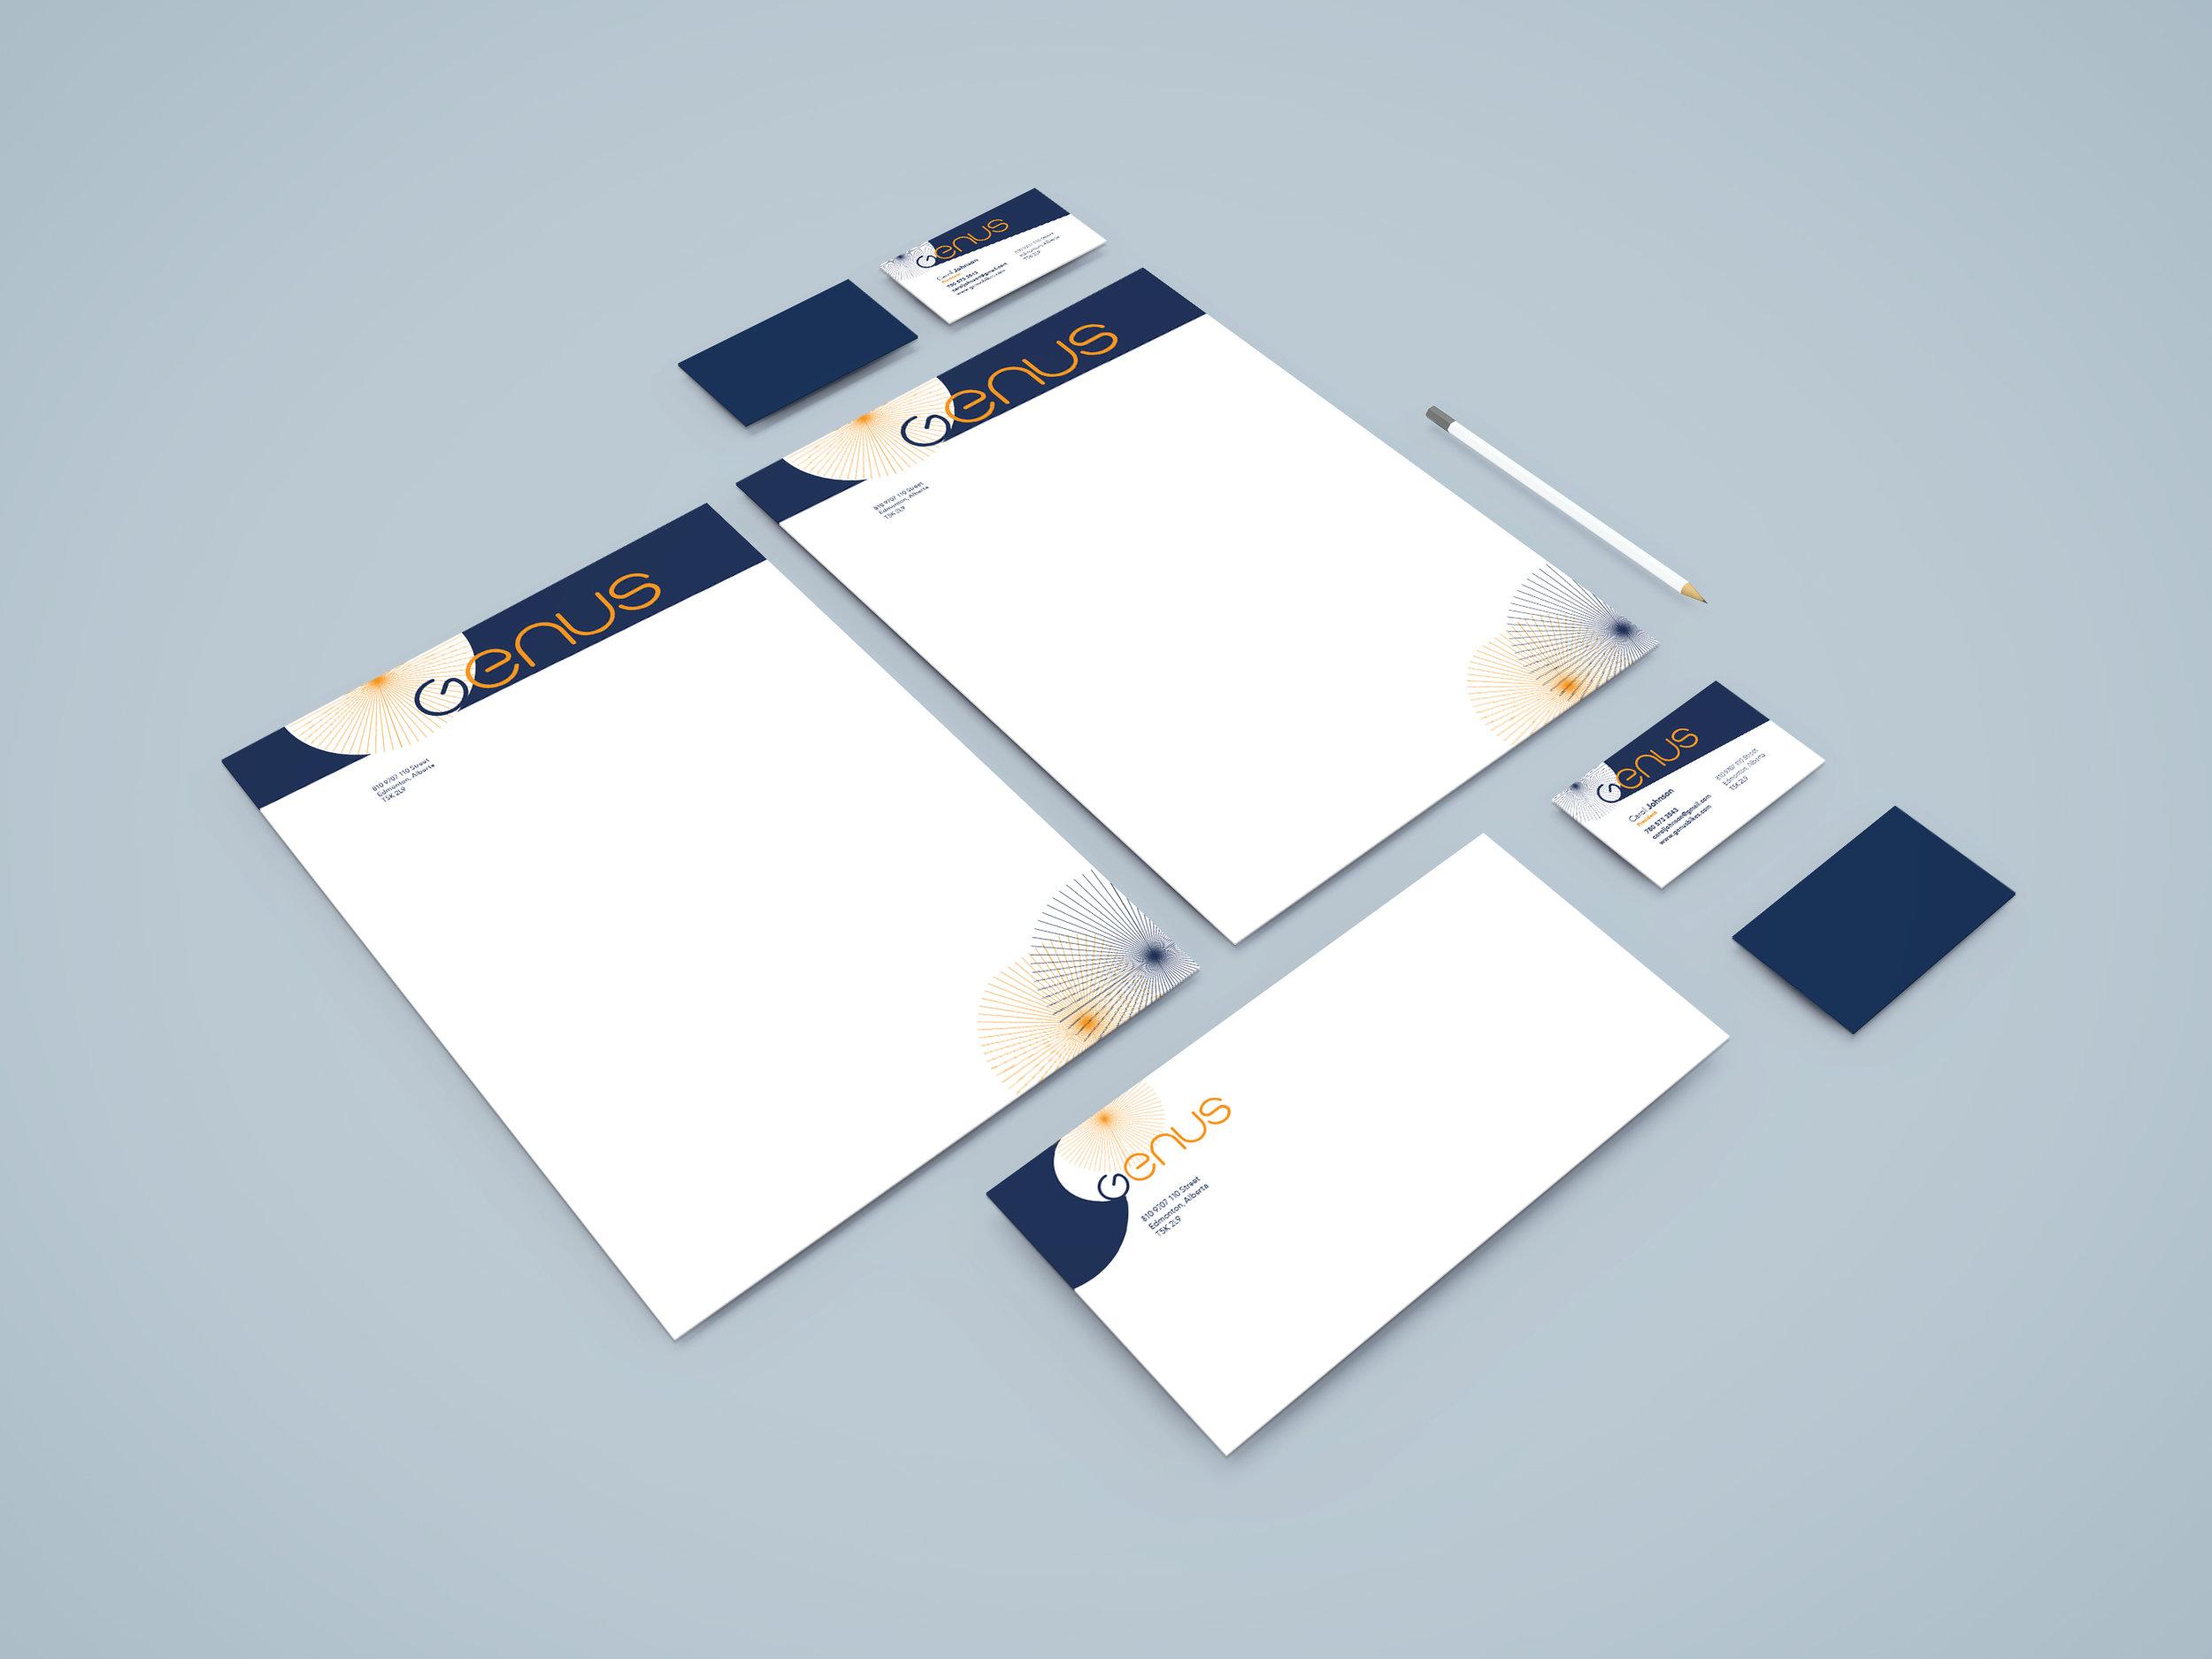 Perspective Branding Stationery Mockup.jpg